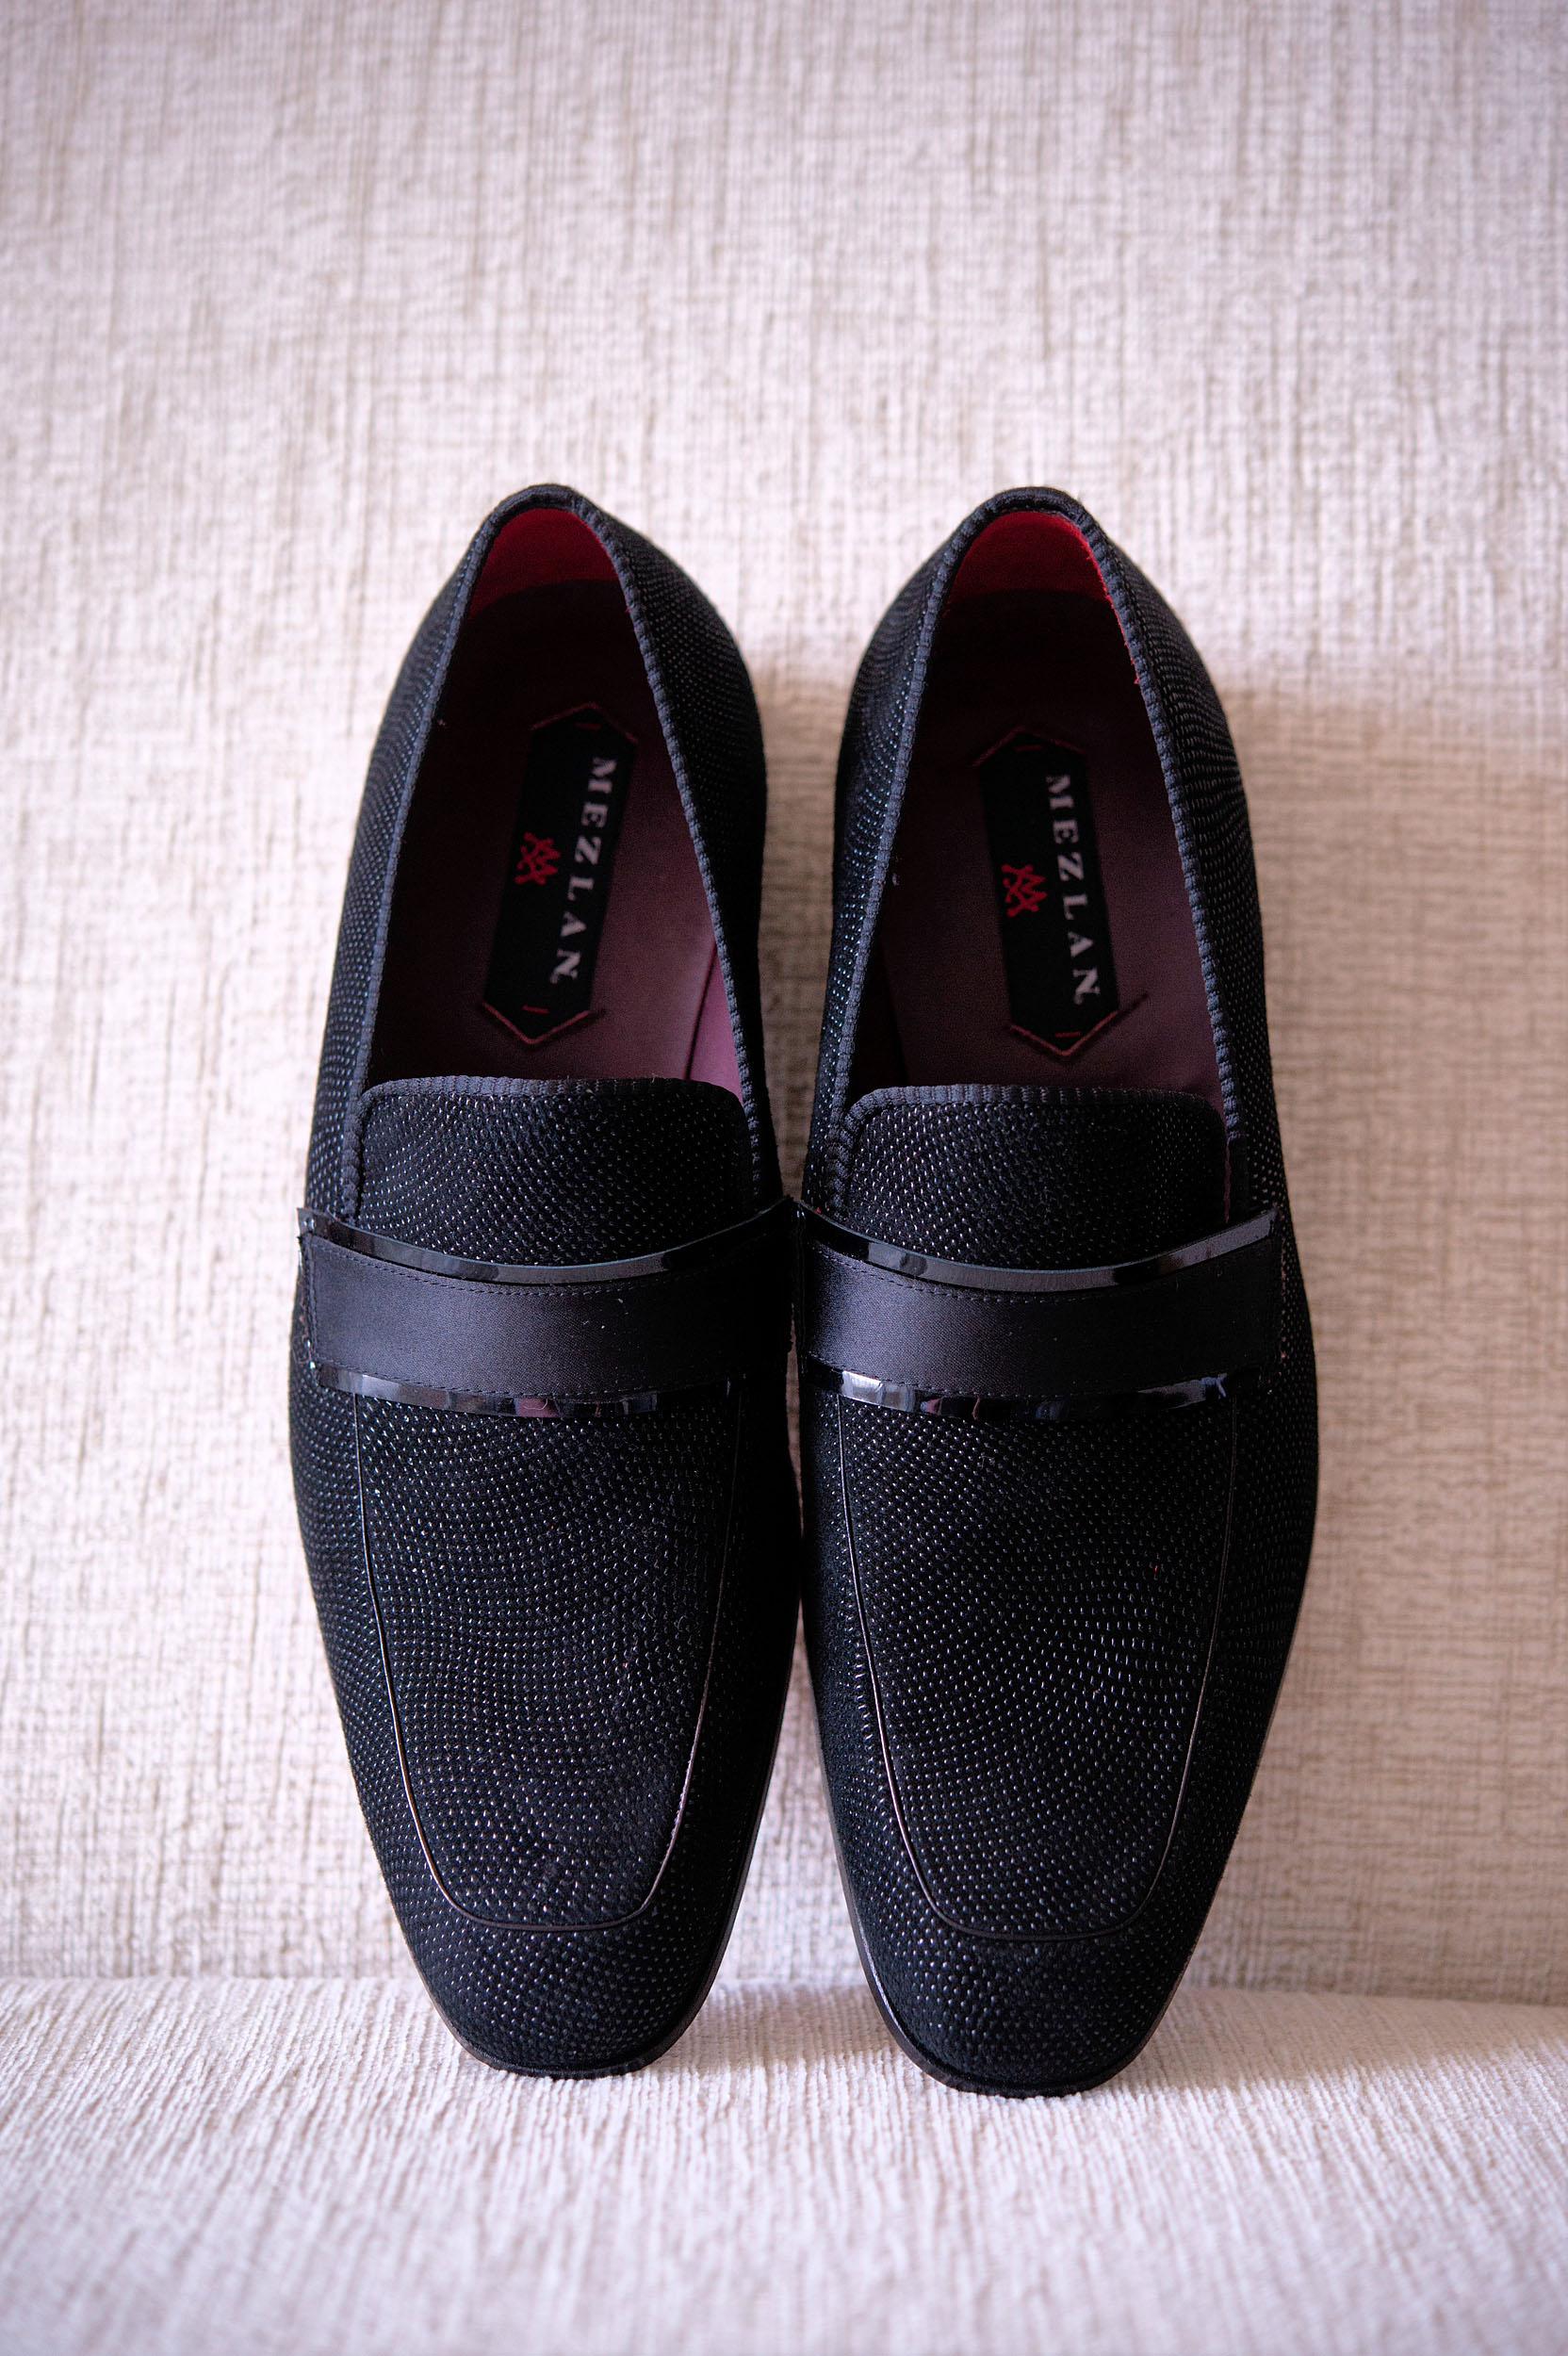 Groom's Mezlan dress shoes detail.